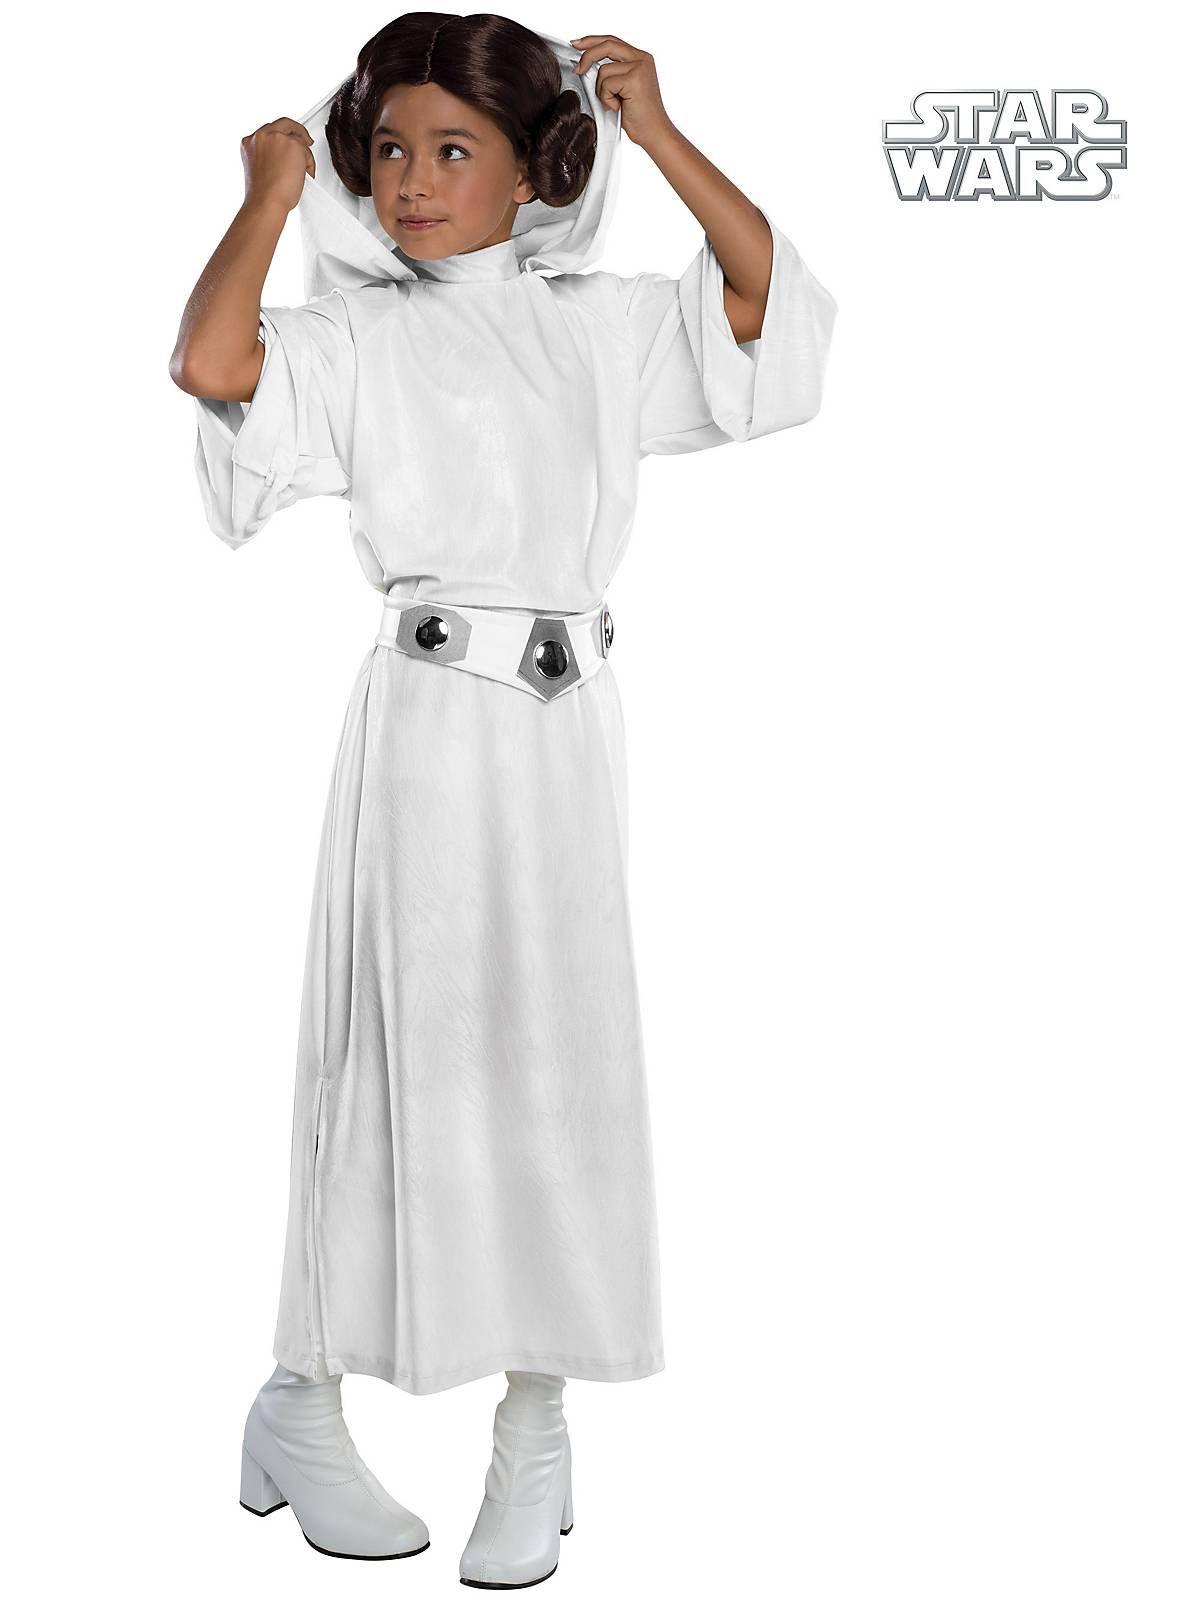 Large Rubies Costume Universal Studios Childs Frankenstein Costume